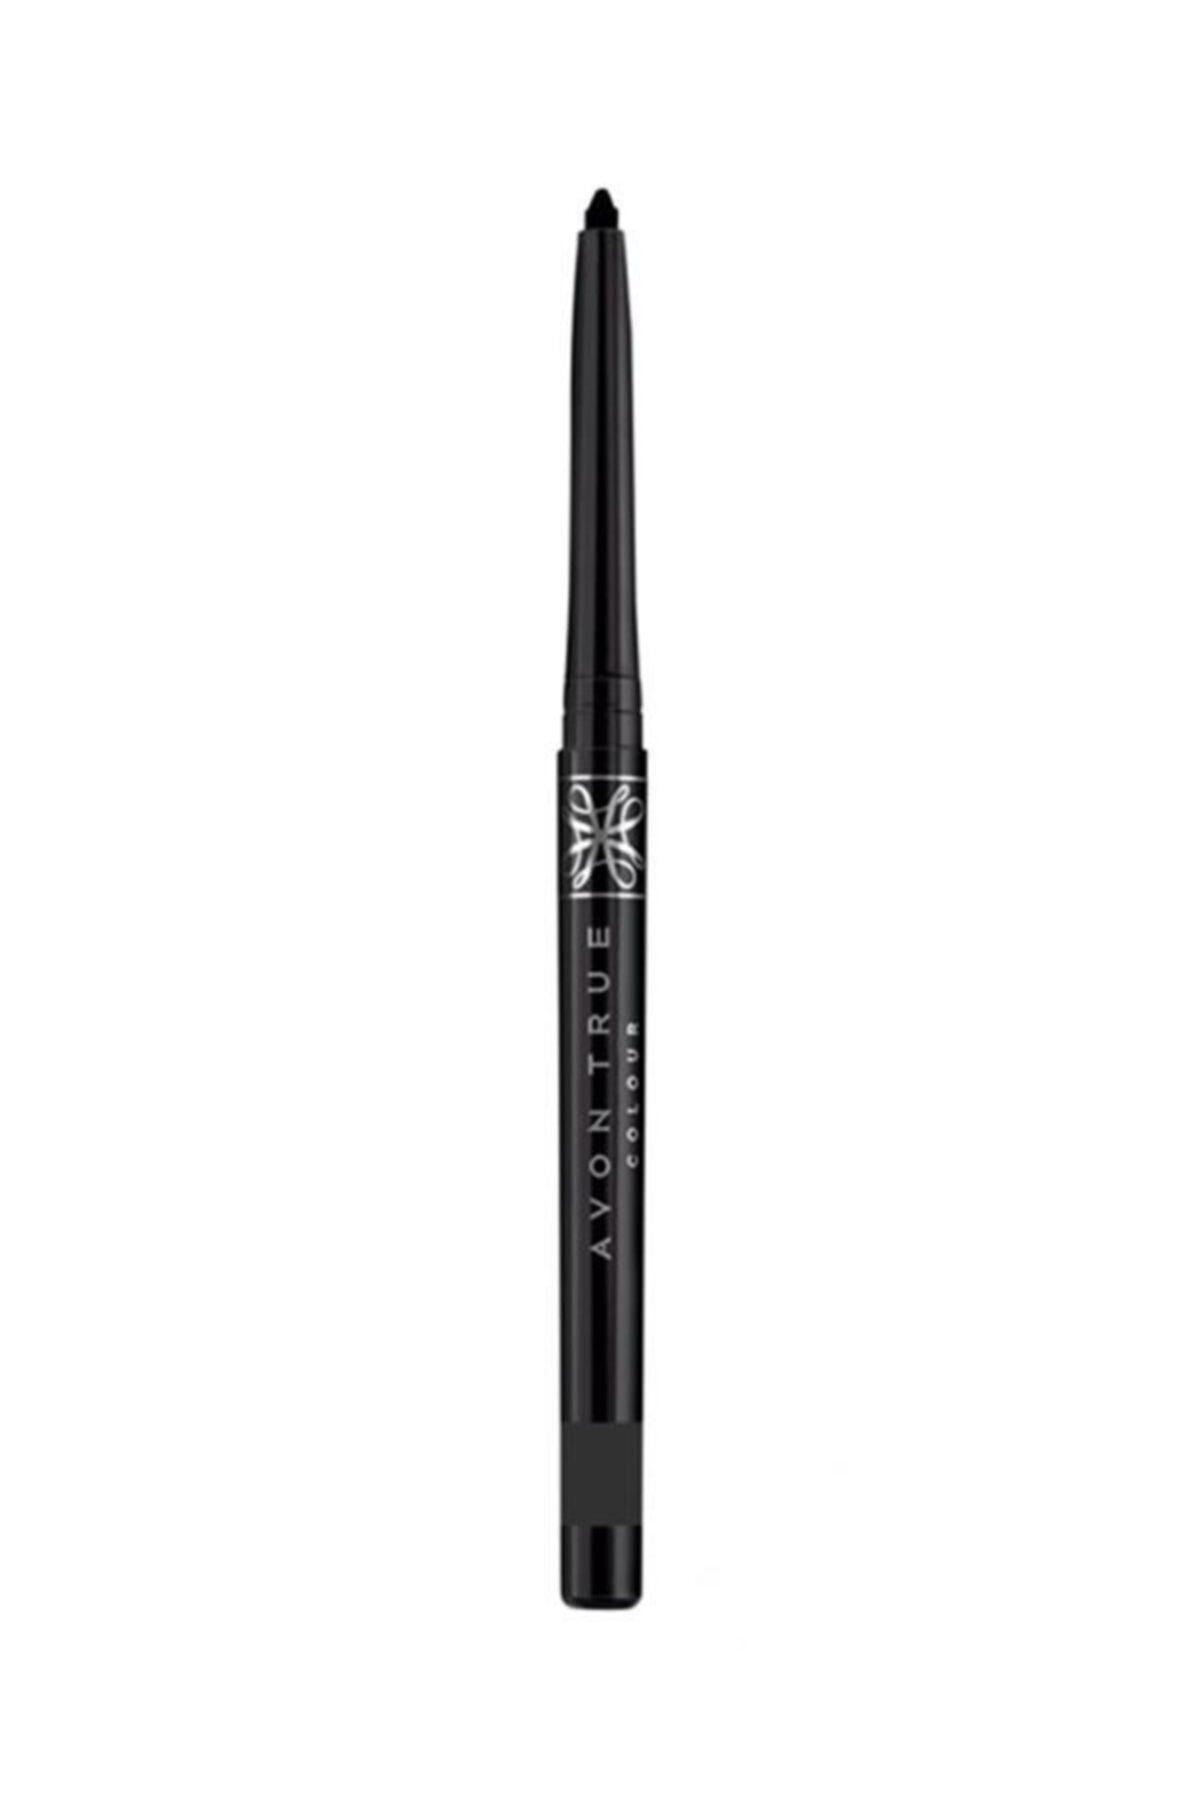 AVON Glimmerstick Asansörlü Göz Kalemi -  Blackest Black 1